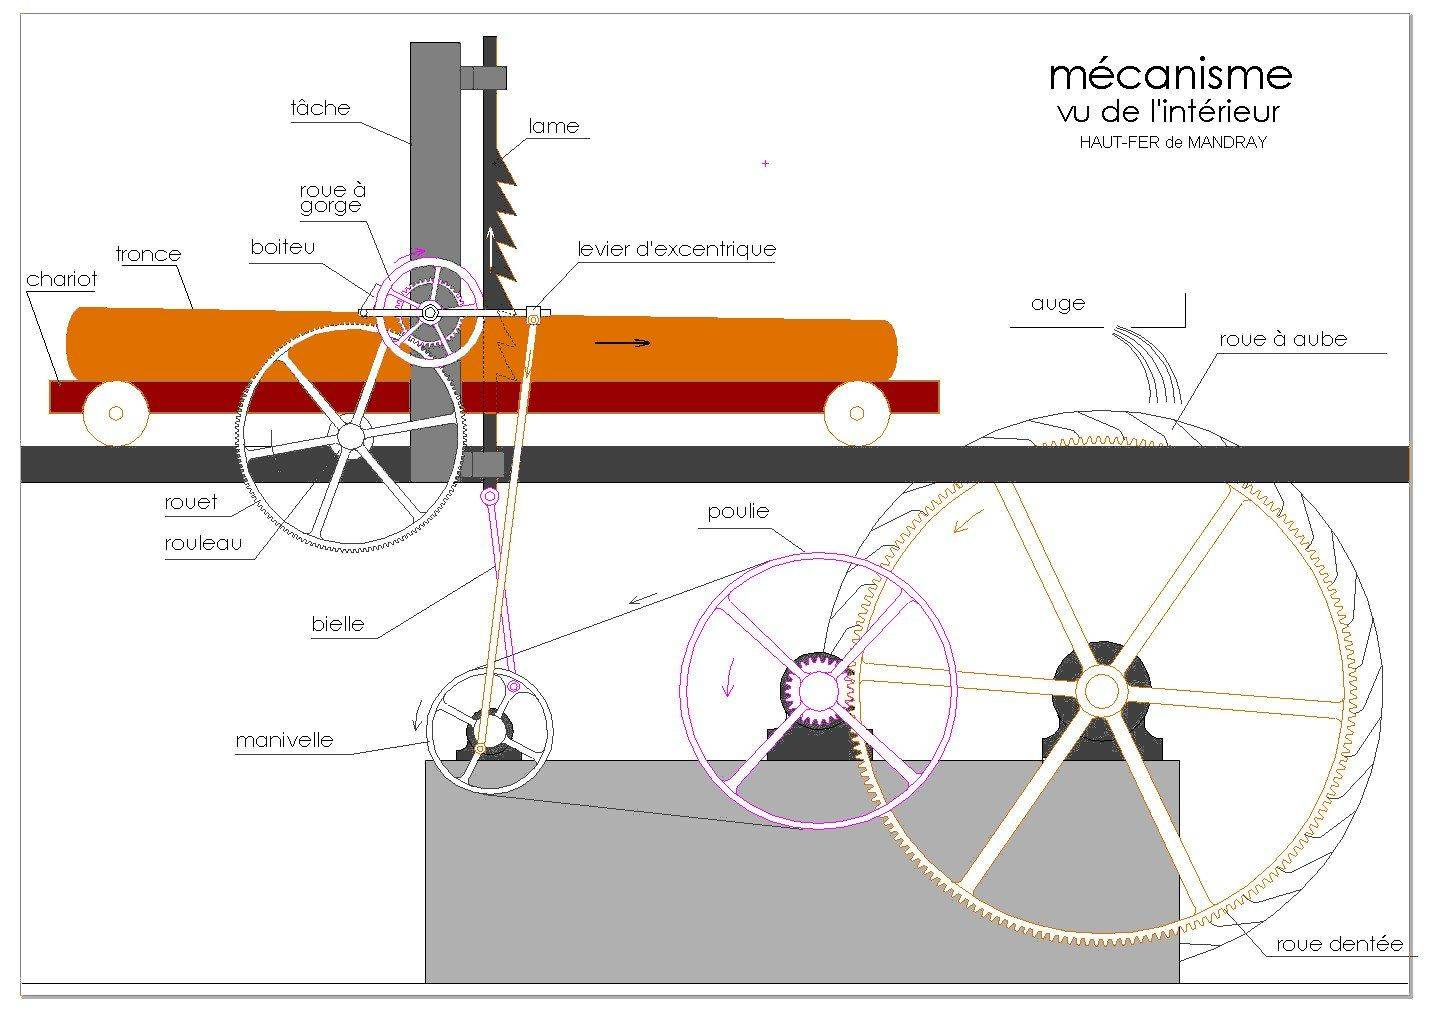 mecanisme.jpg